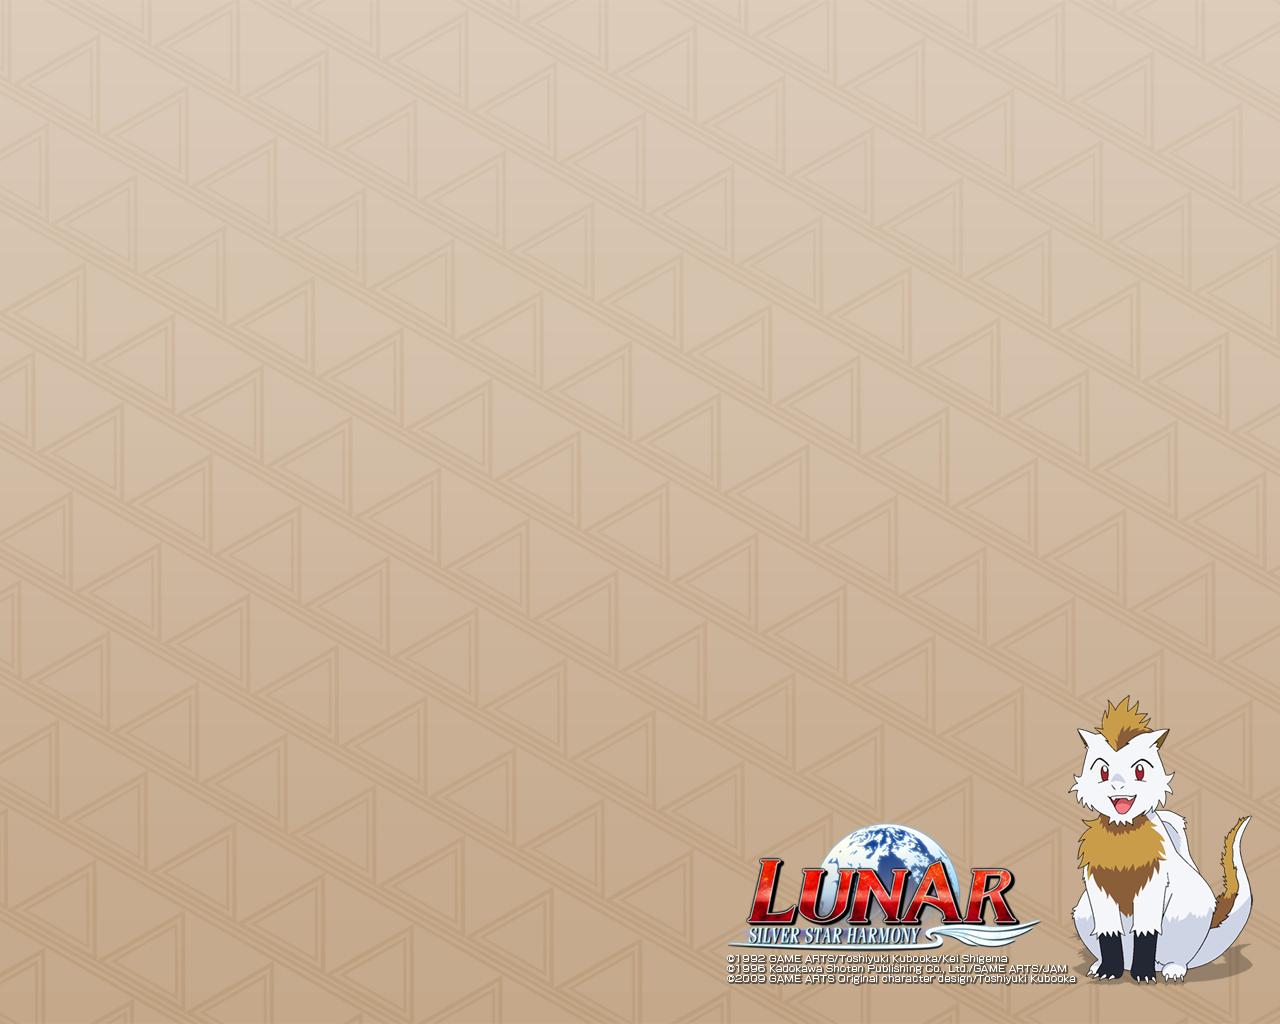 lunar silver star harmony wallpaper game arts co   ltd PSP Controller Sony PSP 3001 Manual